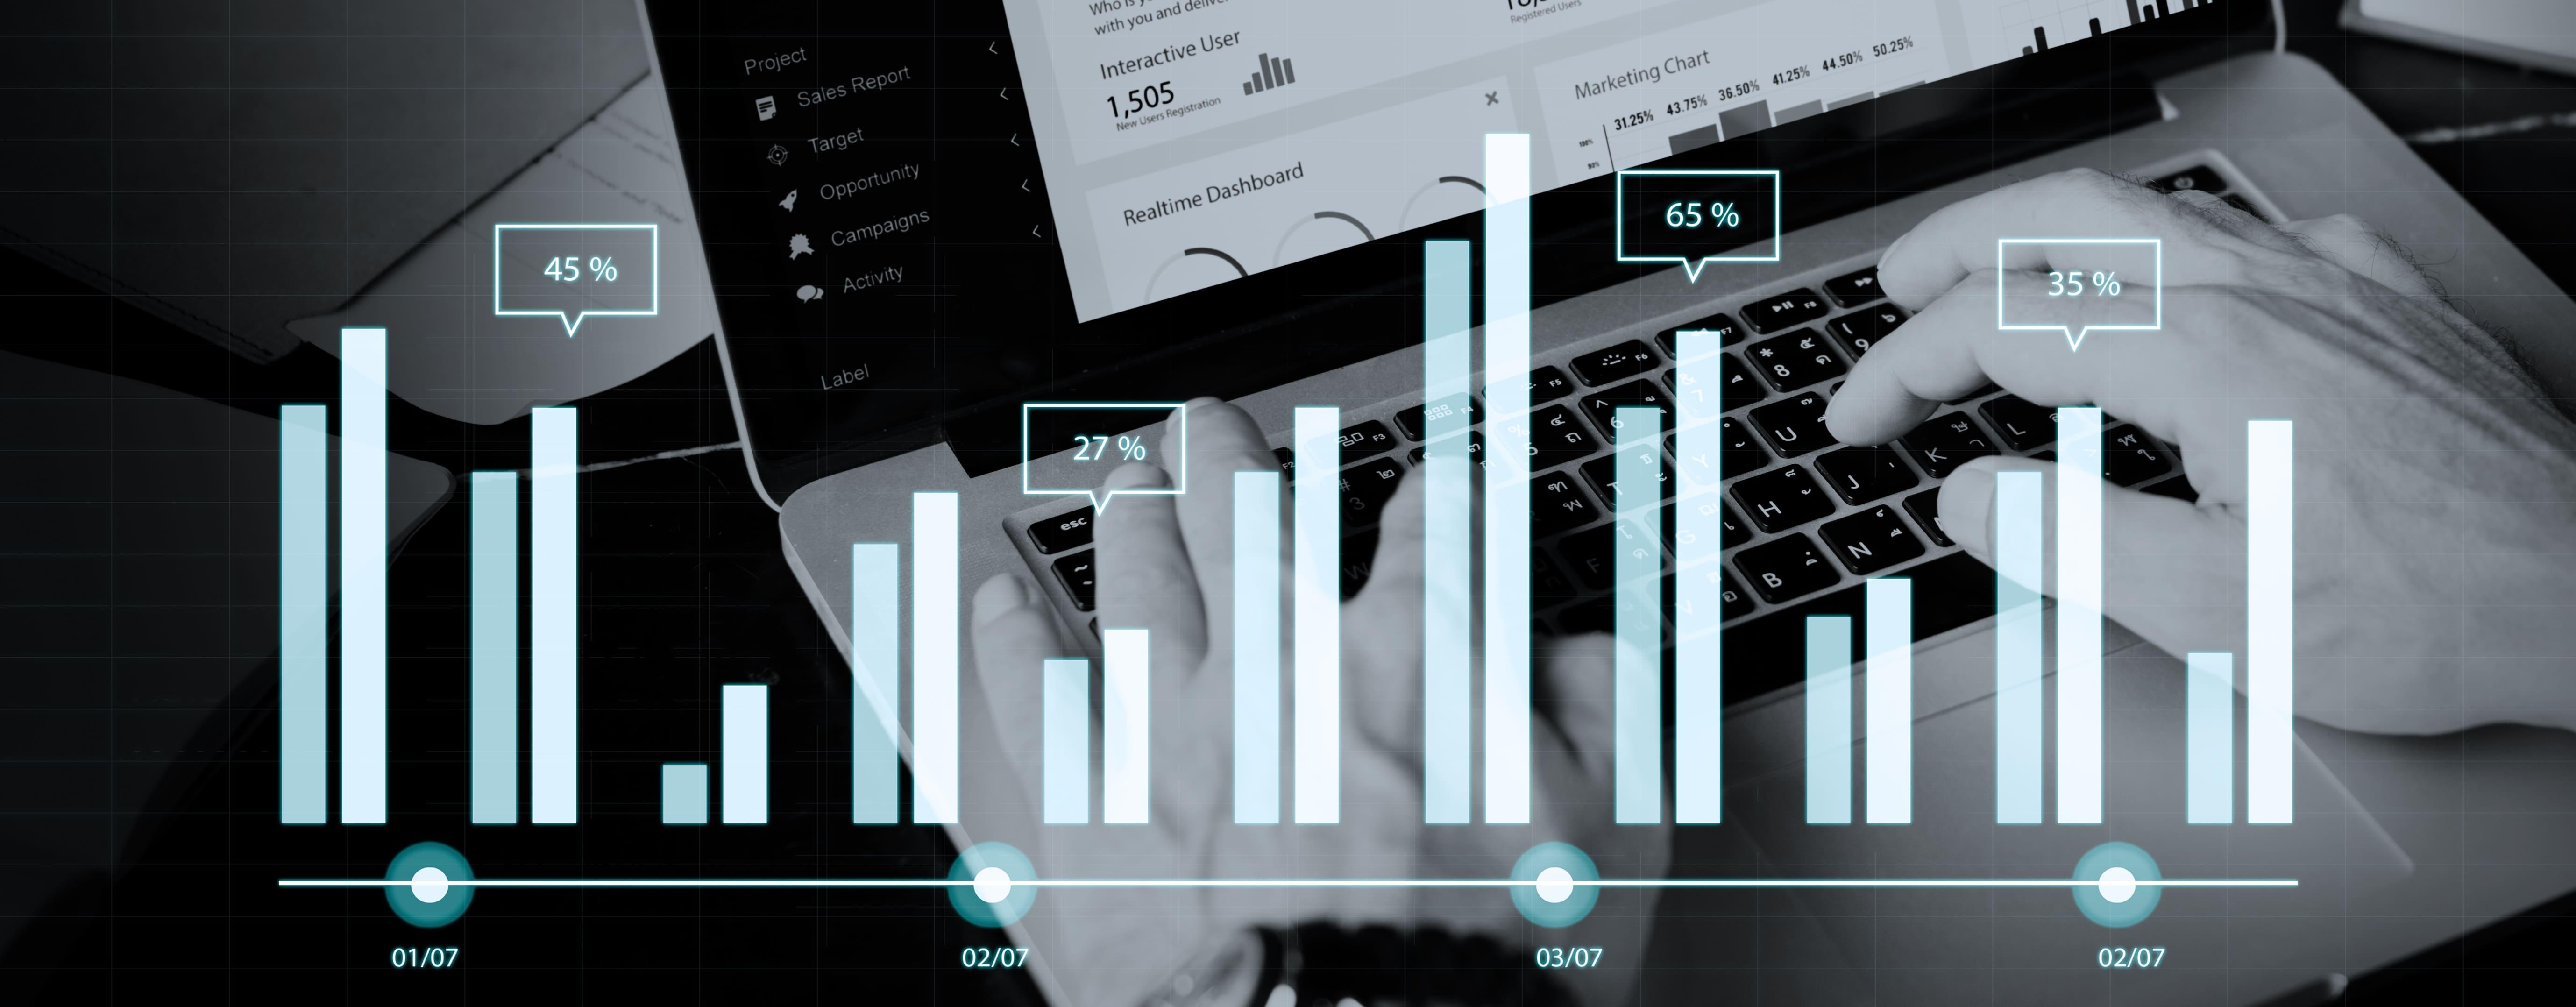 http://www.flashfor.com.br/artigos/business-intelligence-cultura-data-driven-black-mirror-serie-netflix-blog-engdtpmultimidia.jpeg